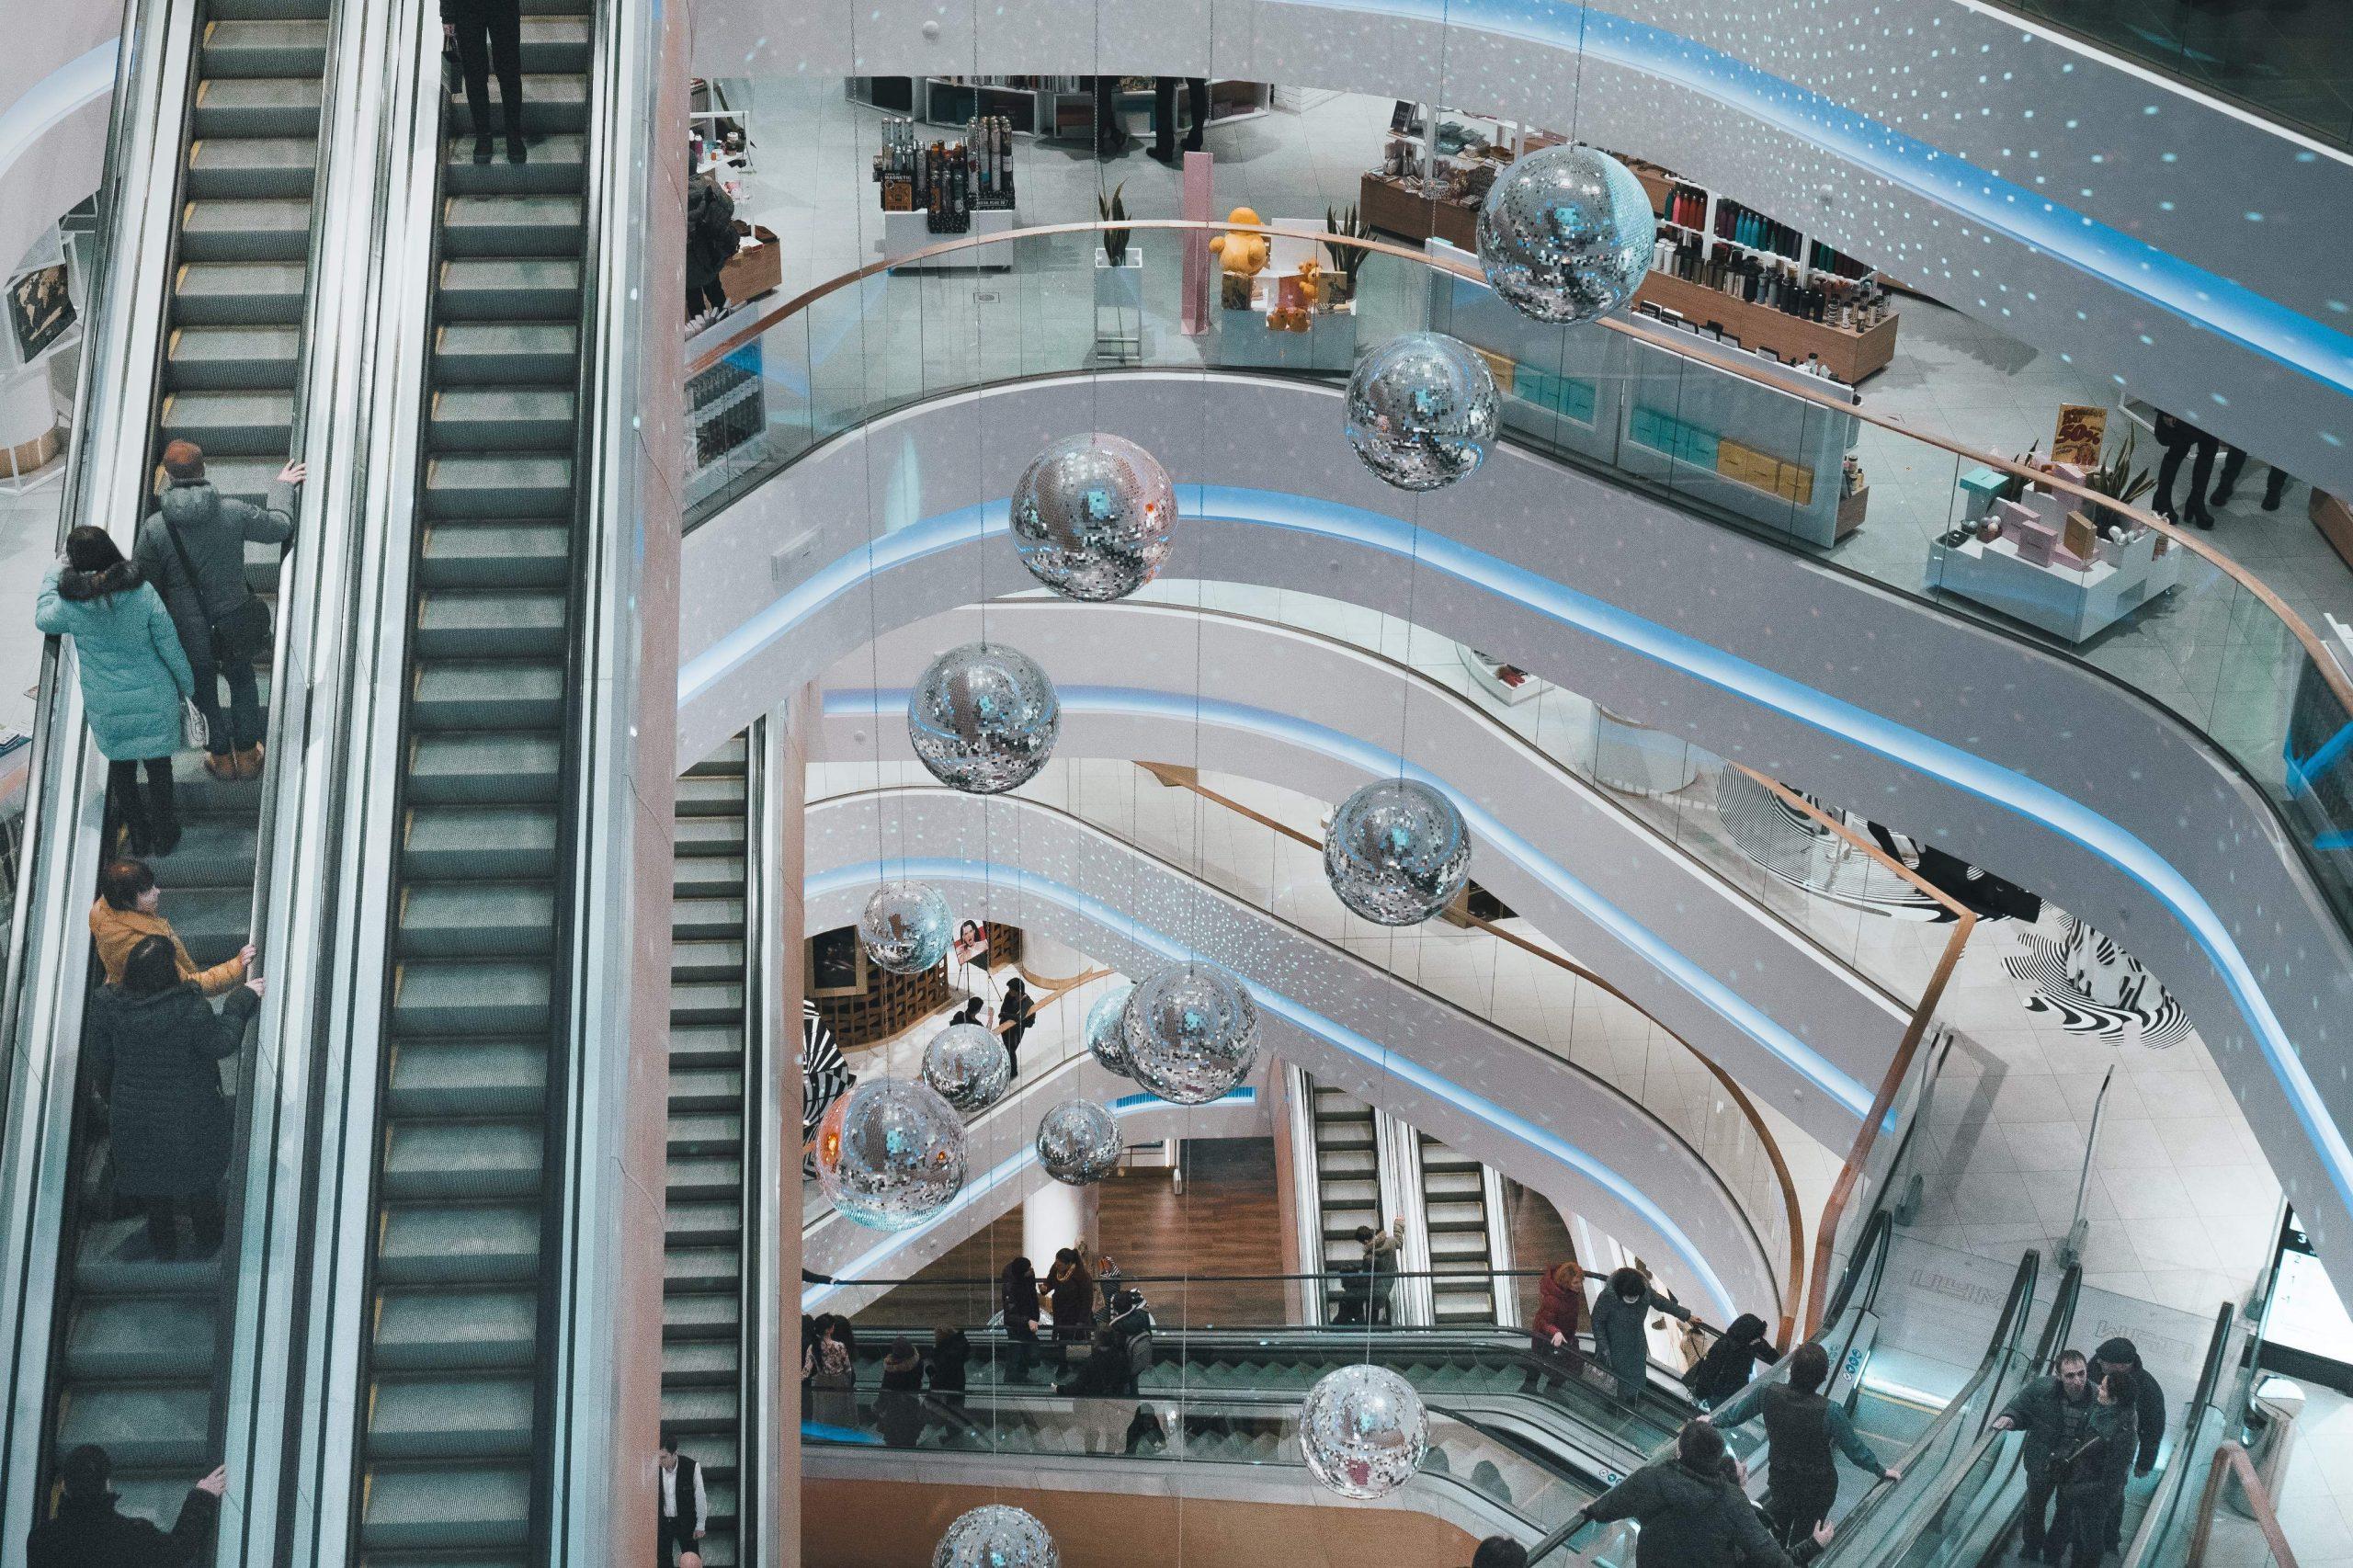 Galerie handlowe już otwarte